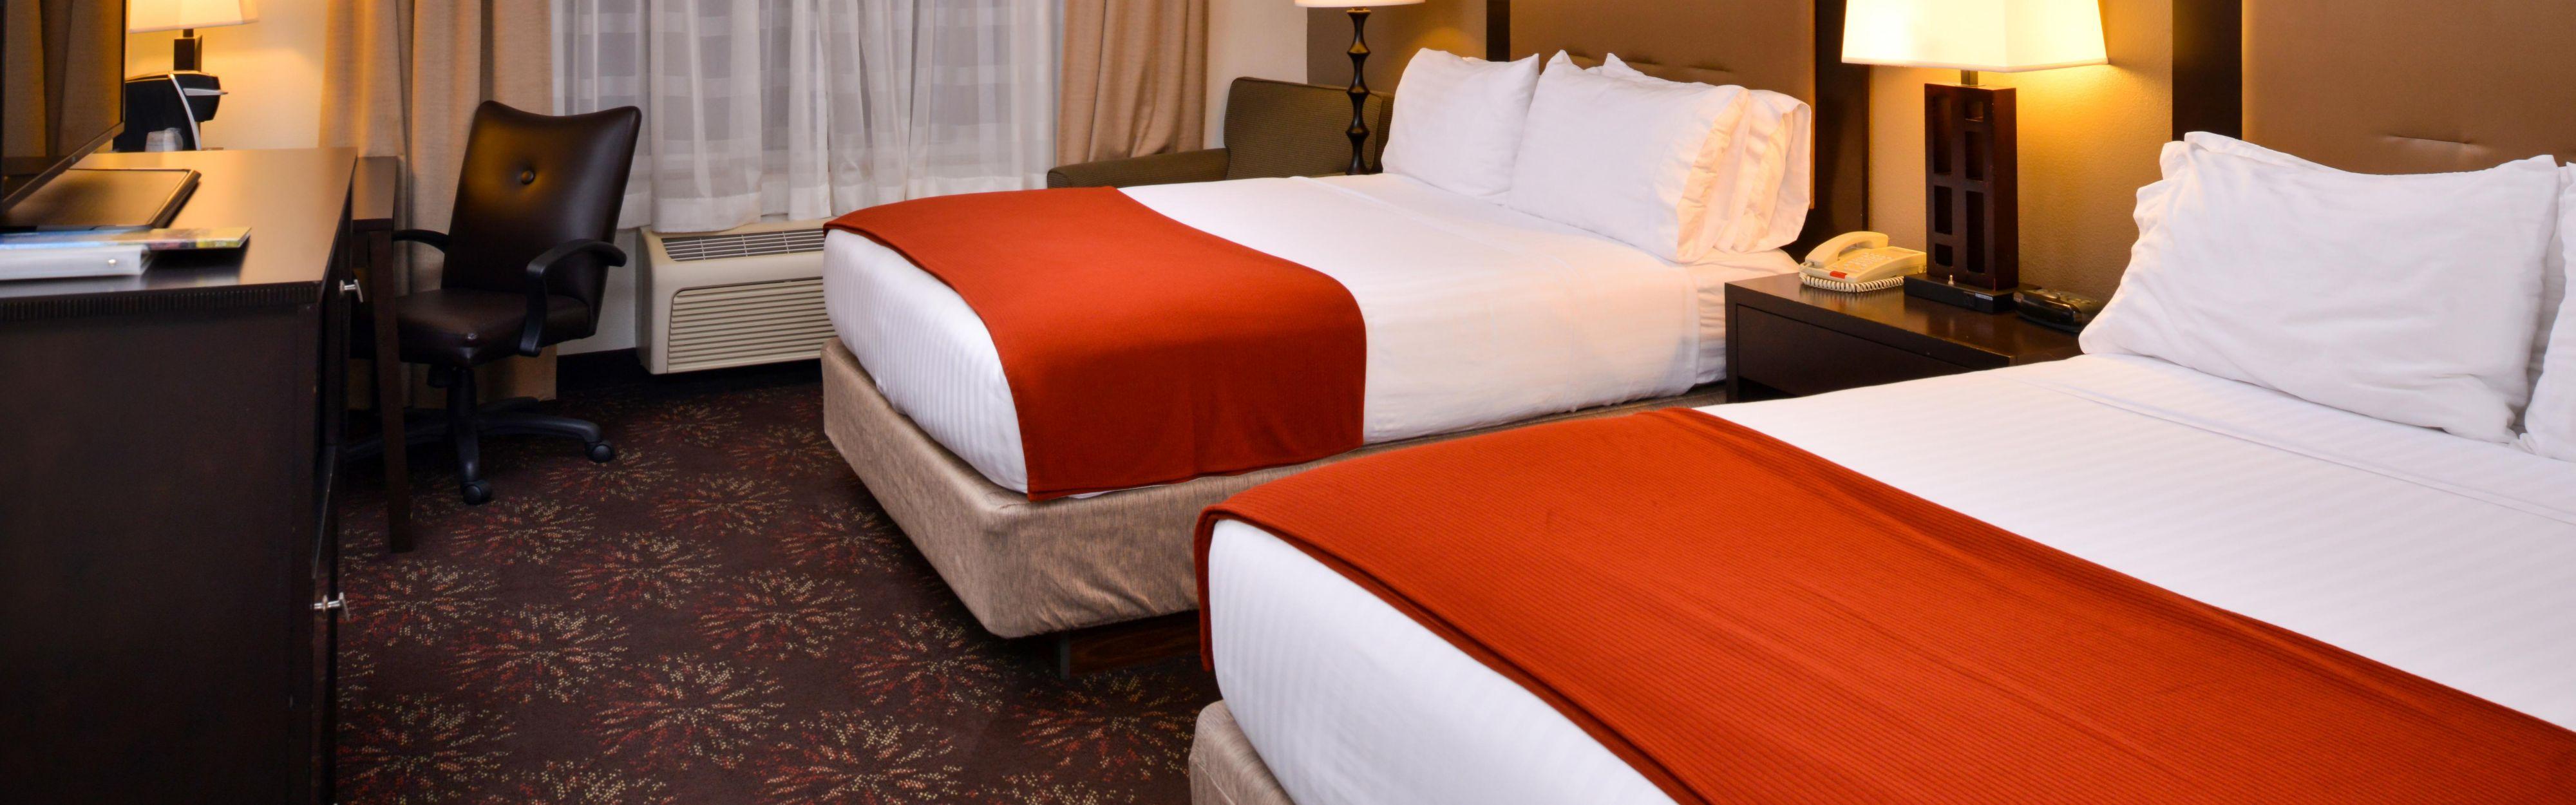 Holiday Inn Express & Suites Lancaster-Lititz image 1